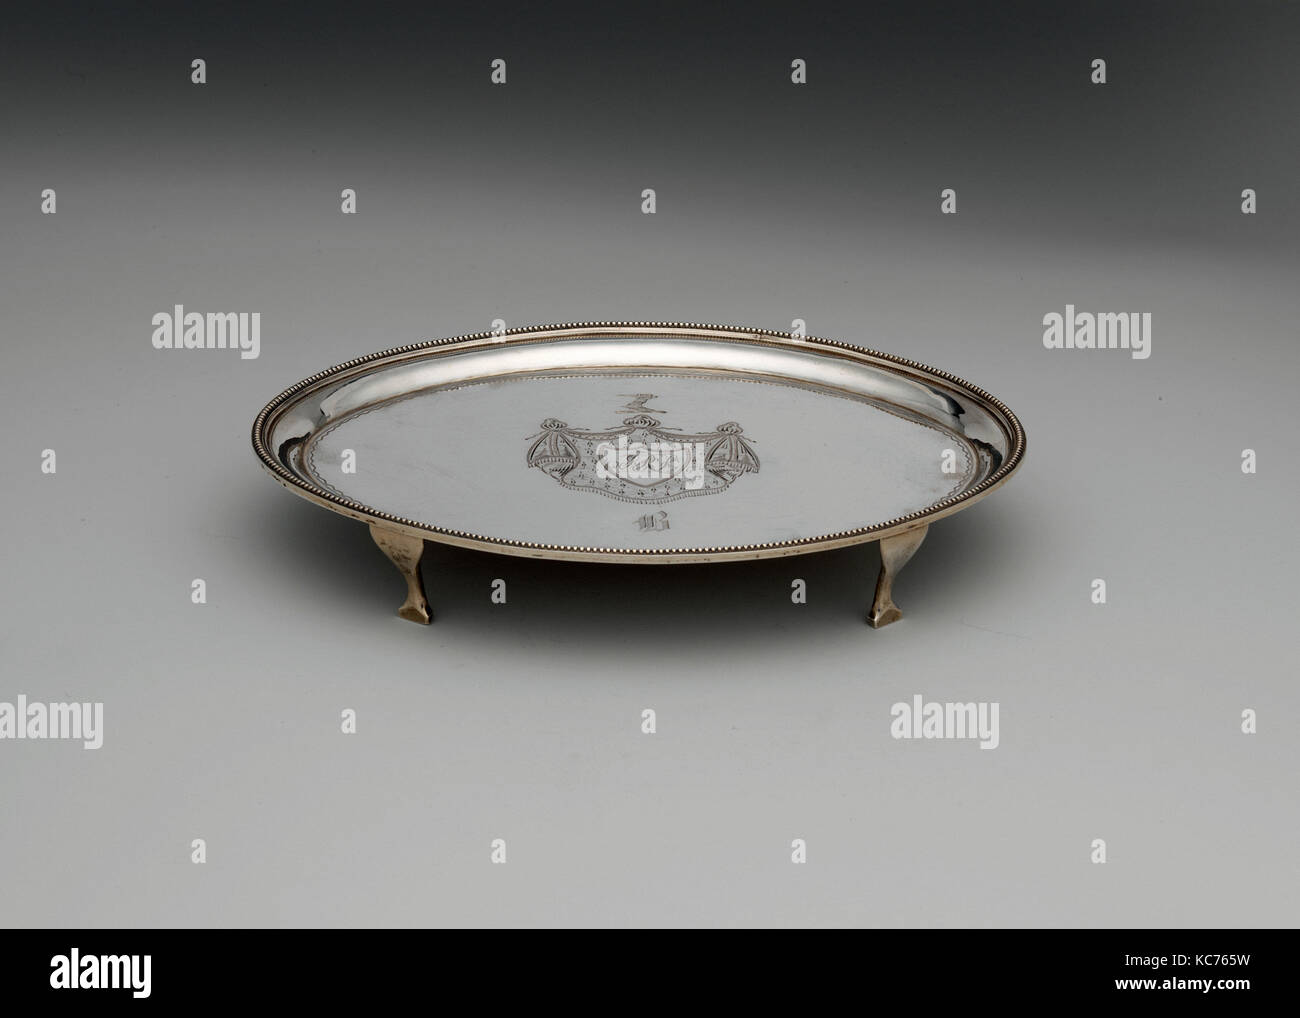 Stand 1790-1800, in New York, New York, United States, US-amerikanischer, Silber, 1 3/16 x 7 5/8 x 5 5/8 in. (3 Stockbild